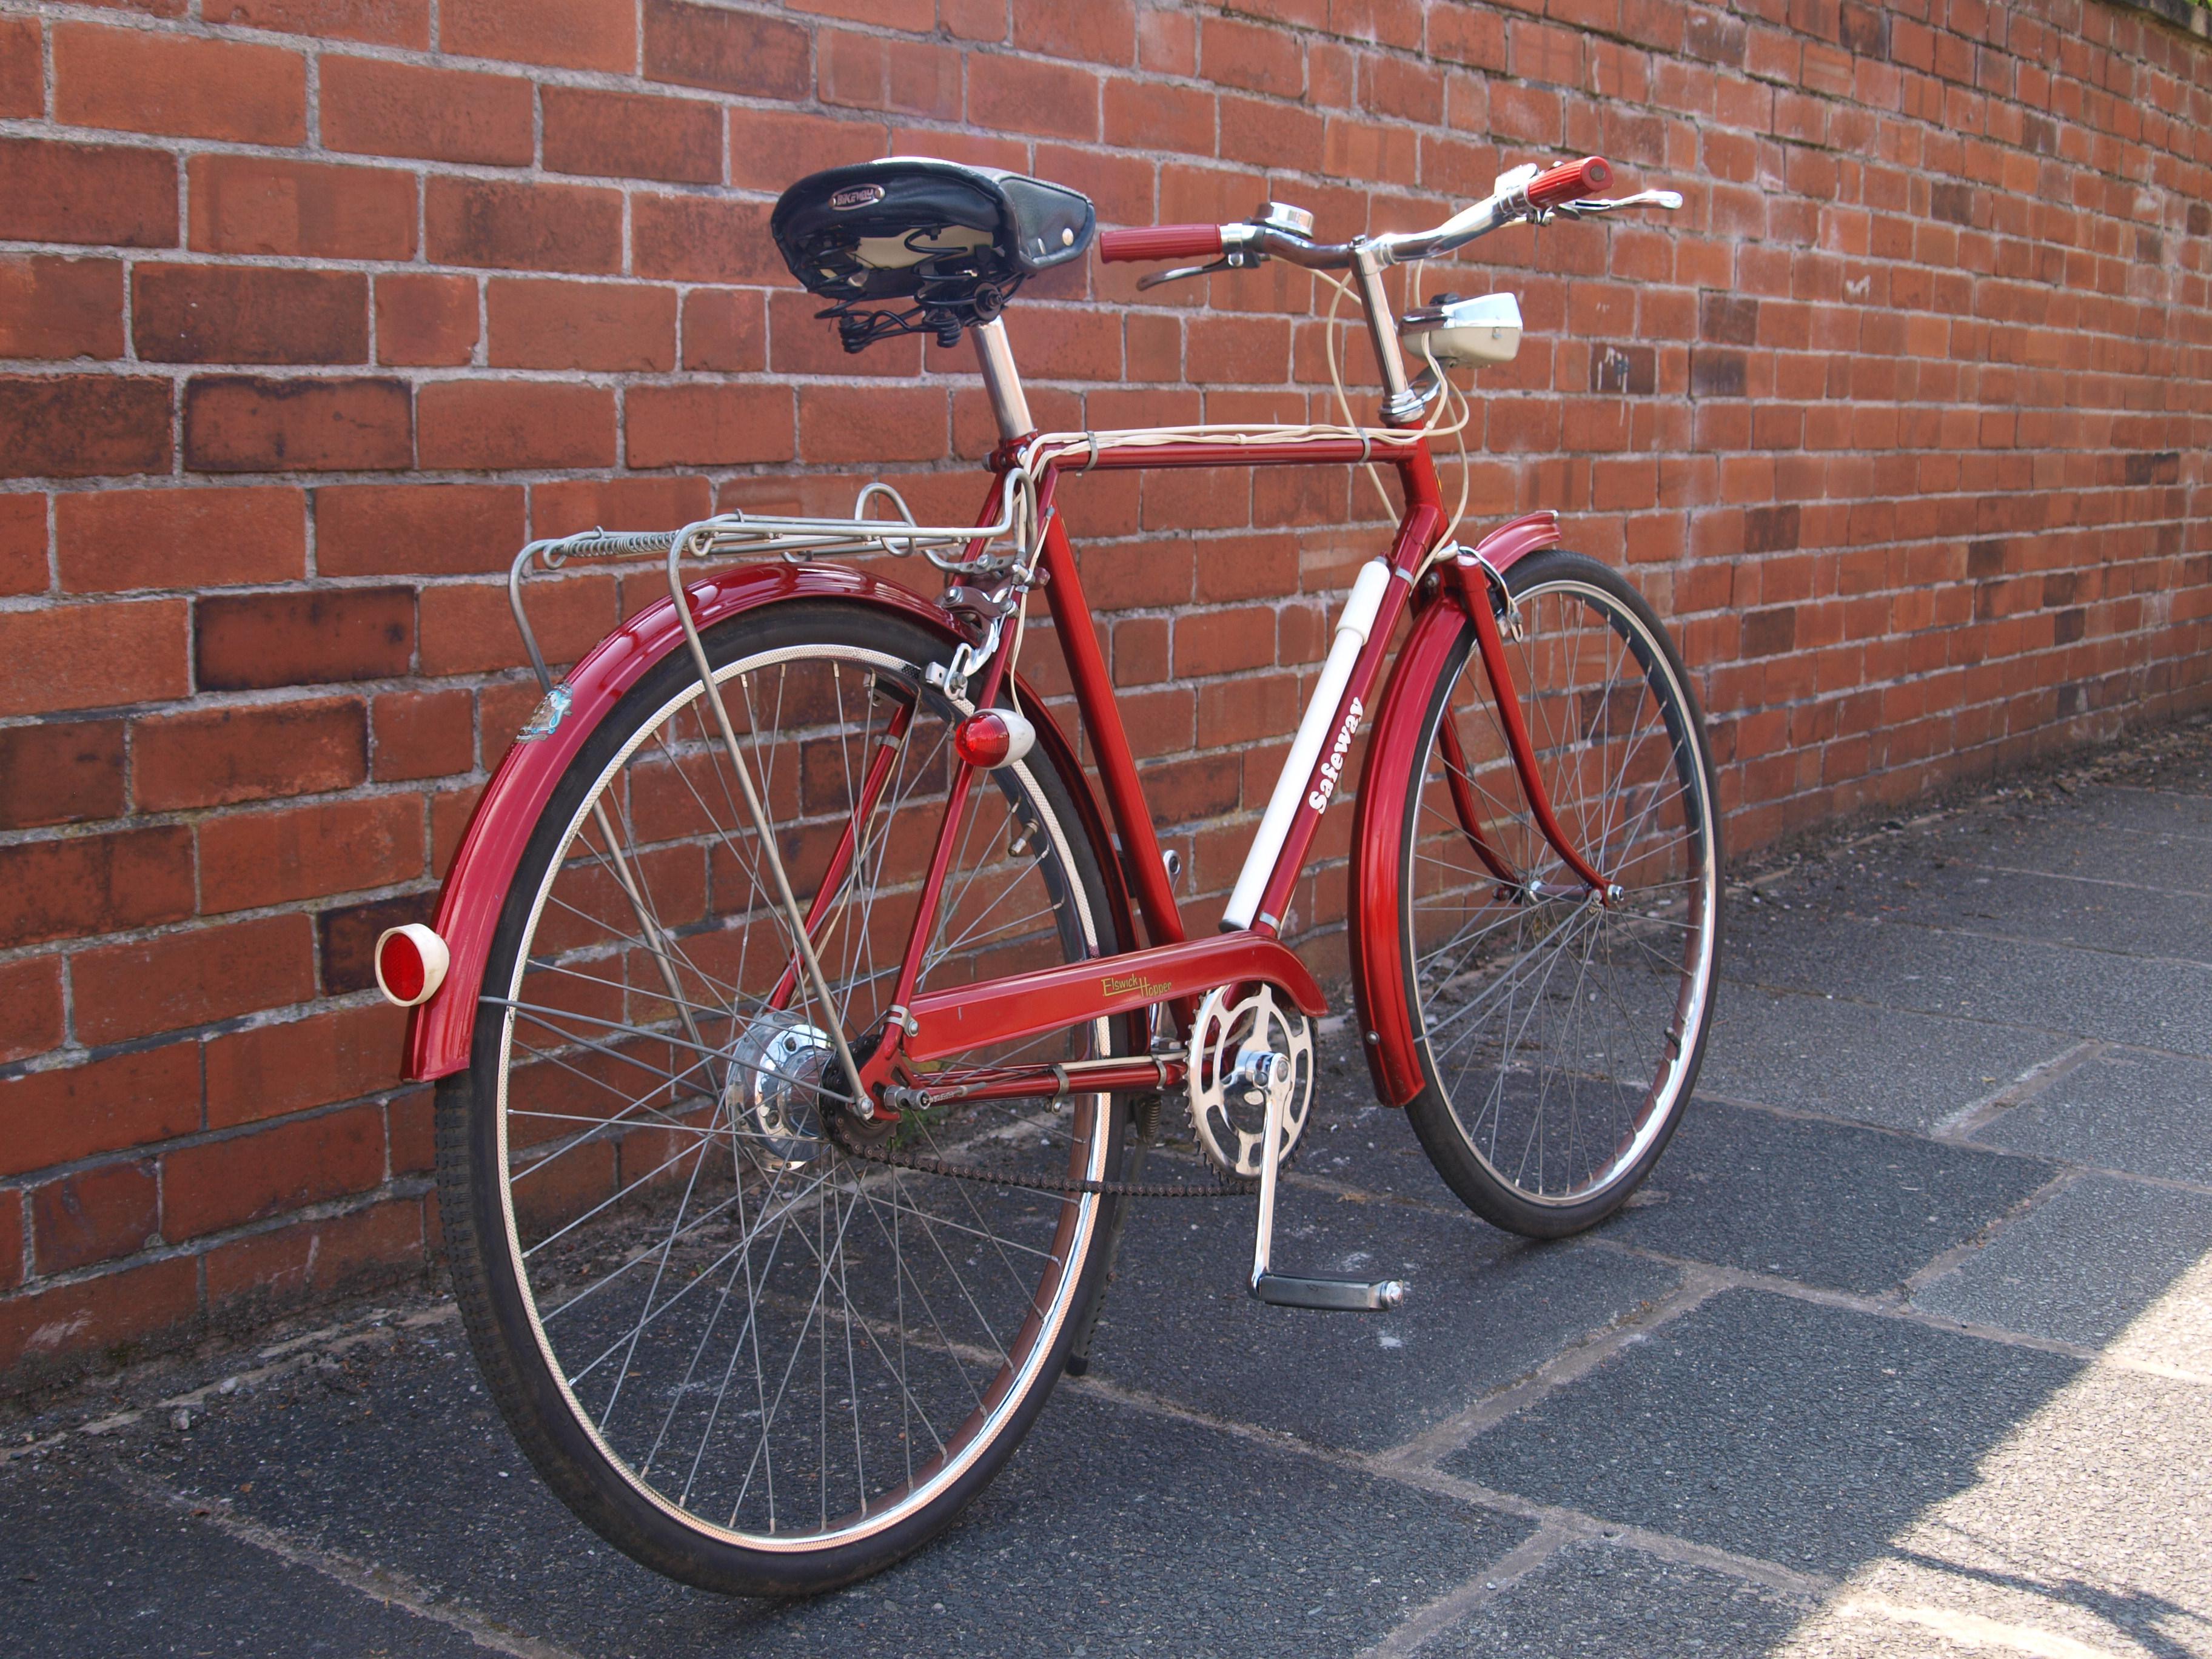 Sports Bikes For Sale Near Me >> 1967 Elswick Hopper Safeway - Dead Rats Cycles